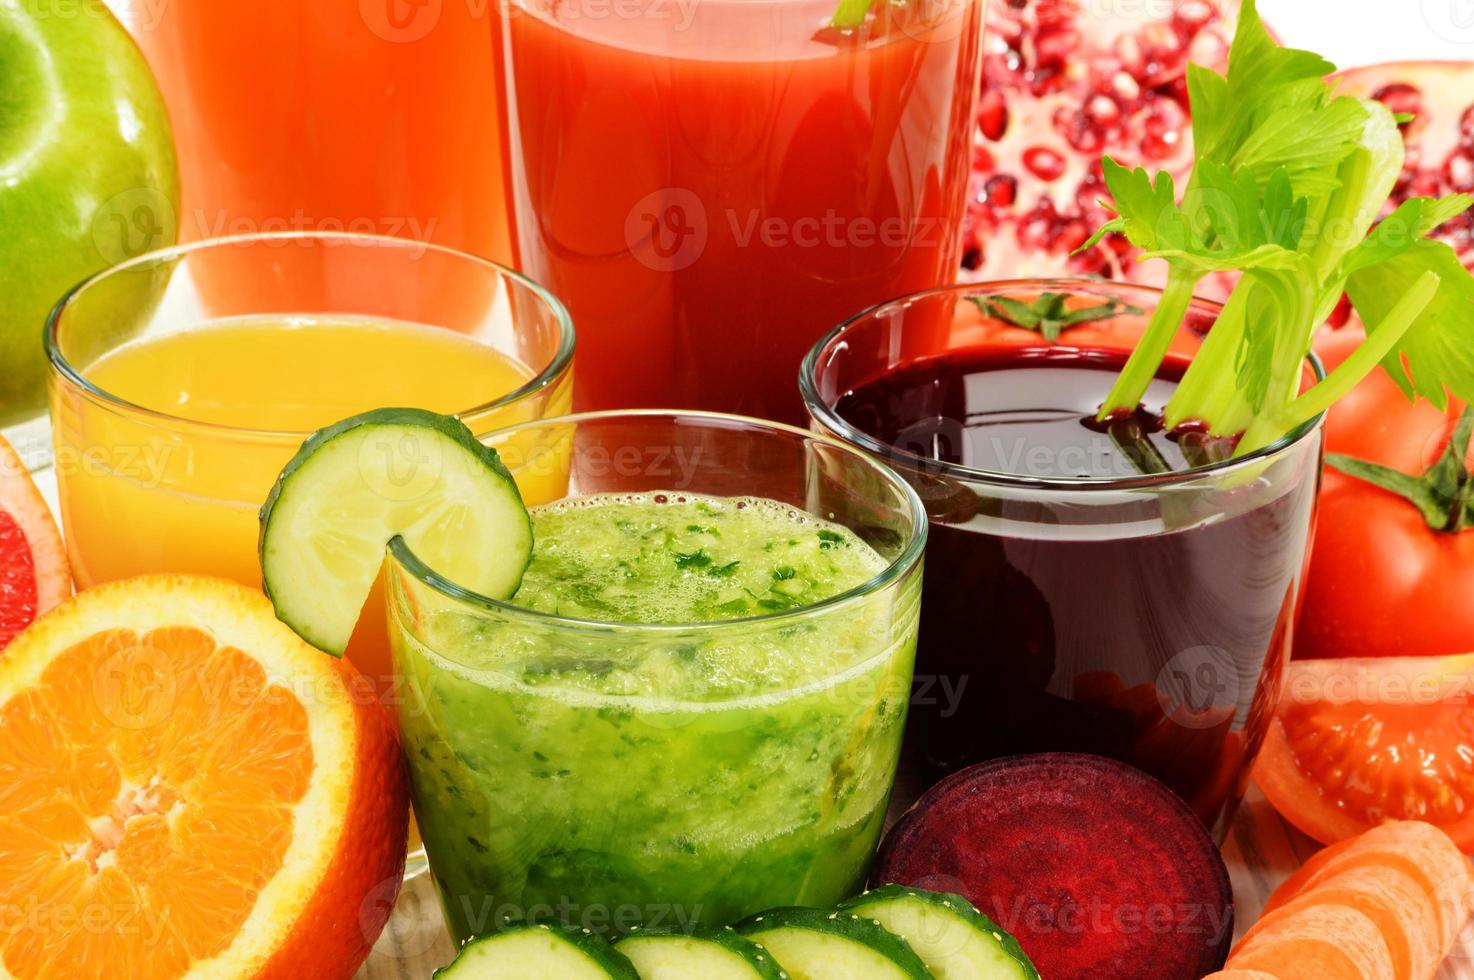 glazen met verse biologische groente- en vruchtensappen foto